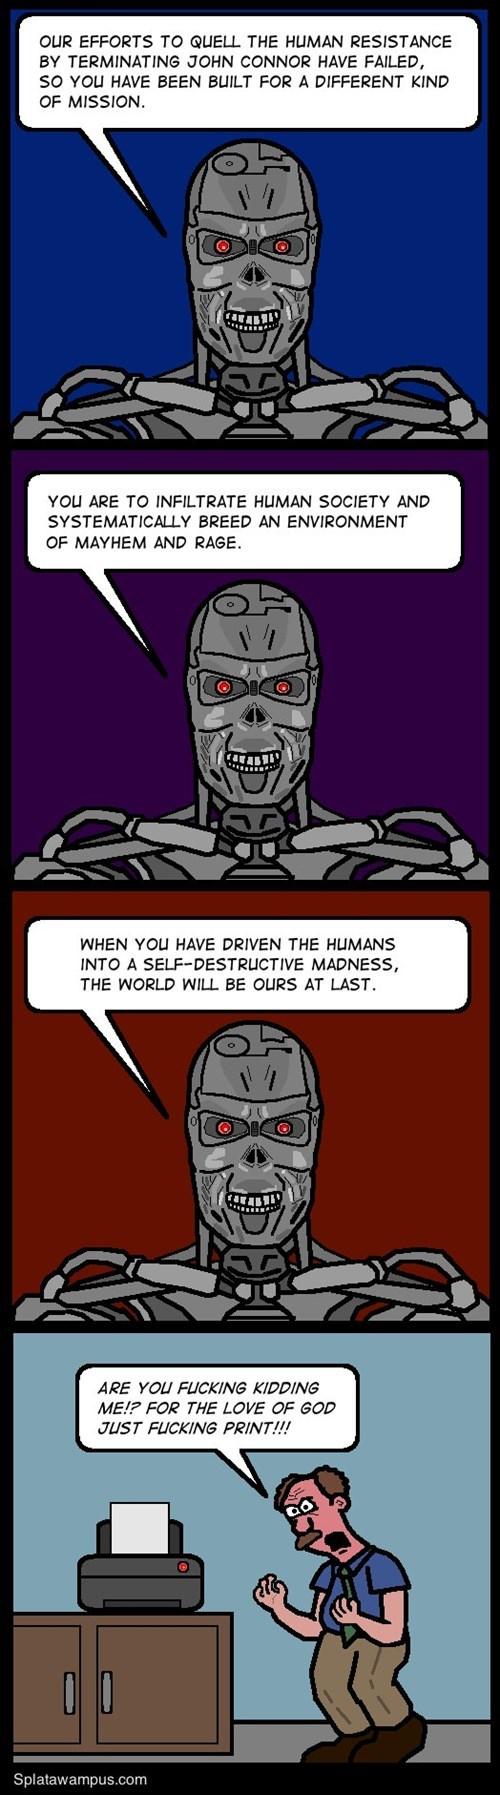 funny-web-comics-skynets-insidious-plan